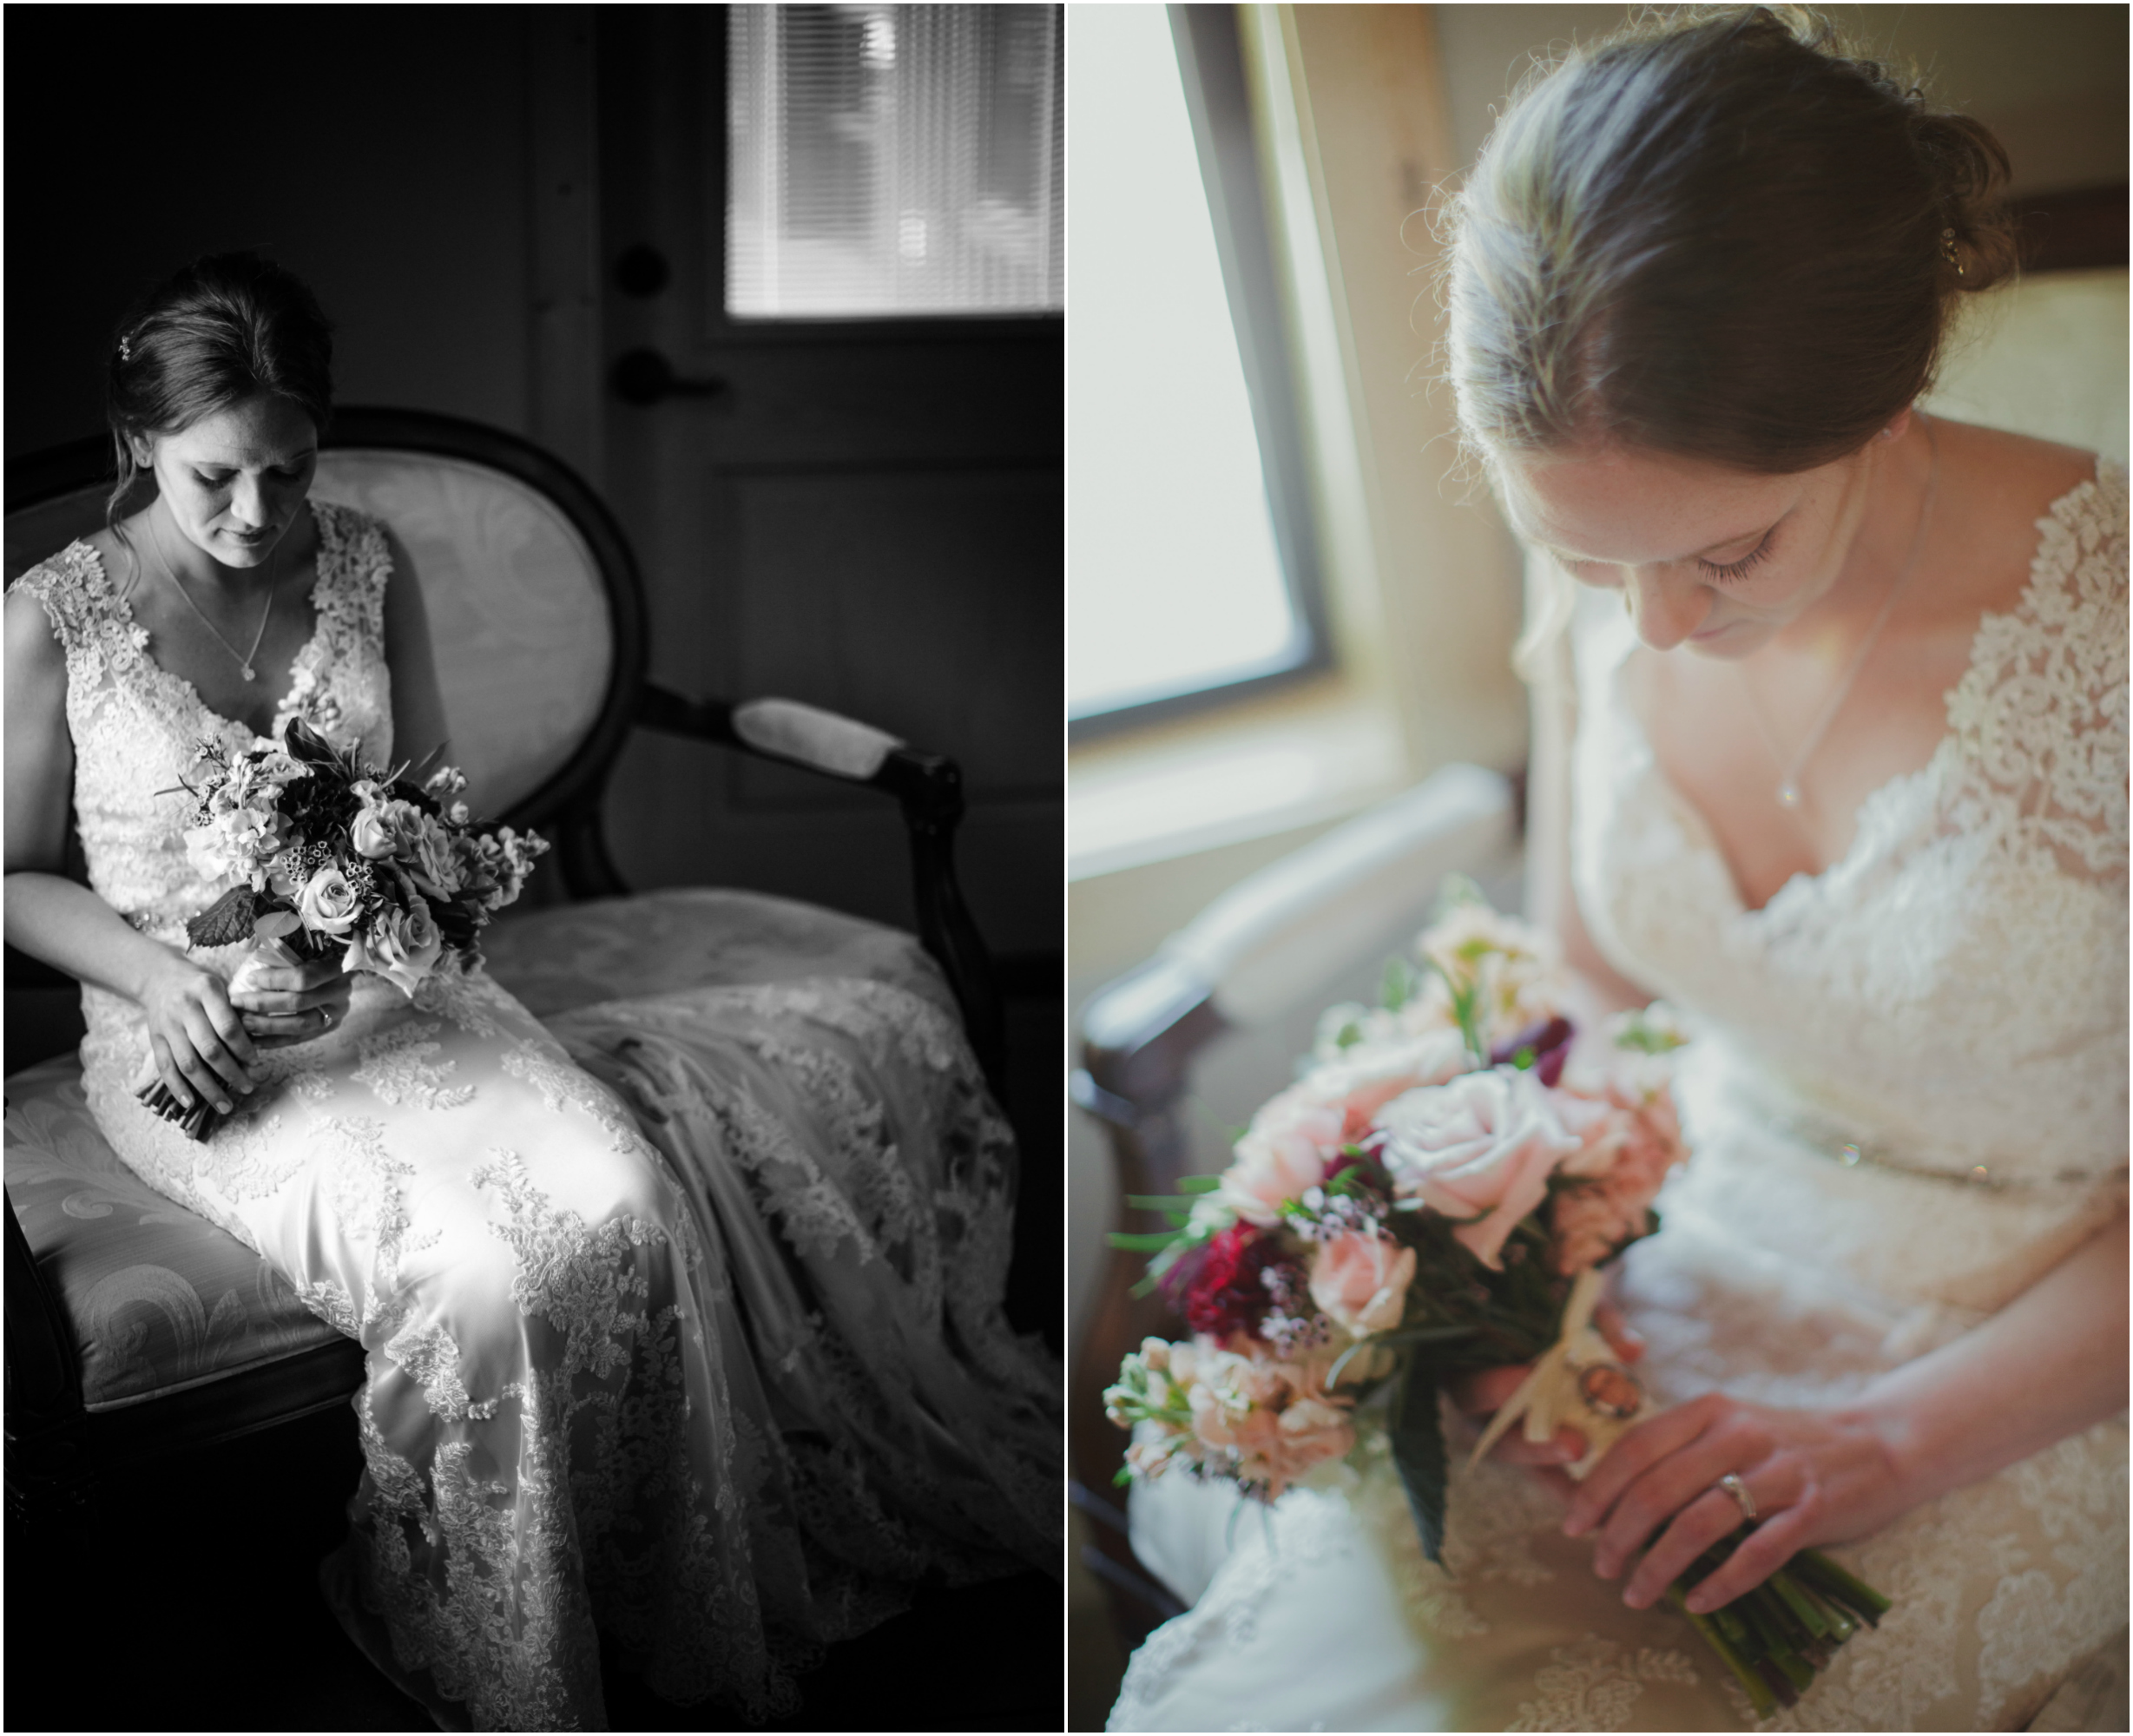 Sioux Falls Bride looking at flowers.jpg